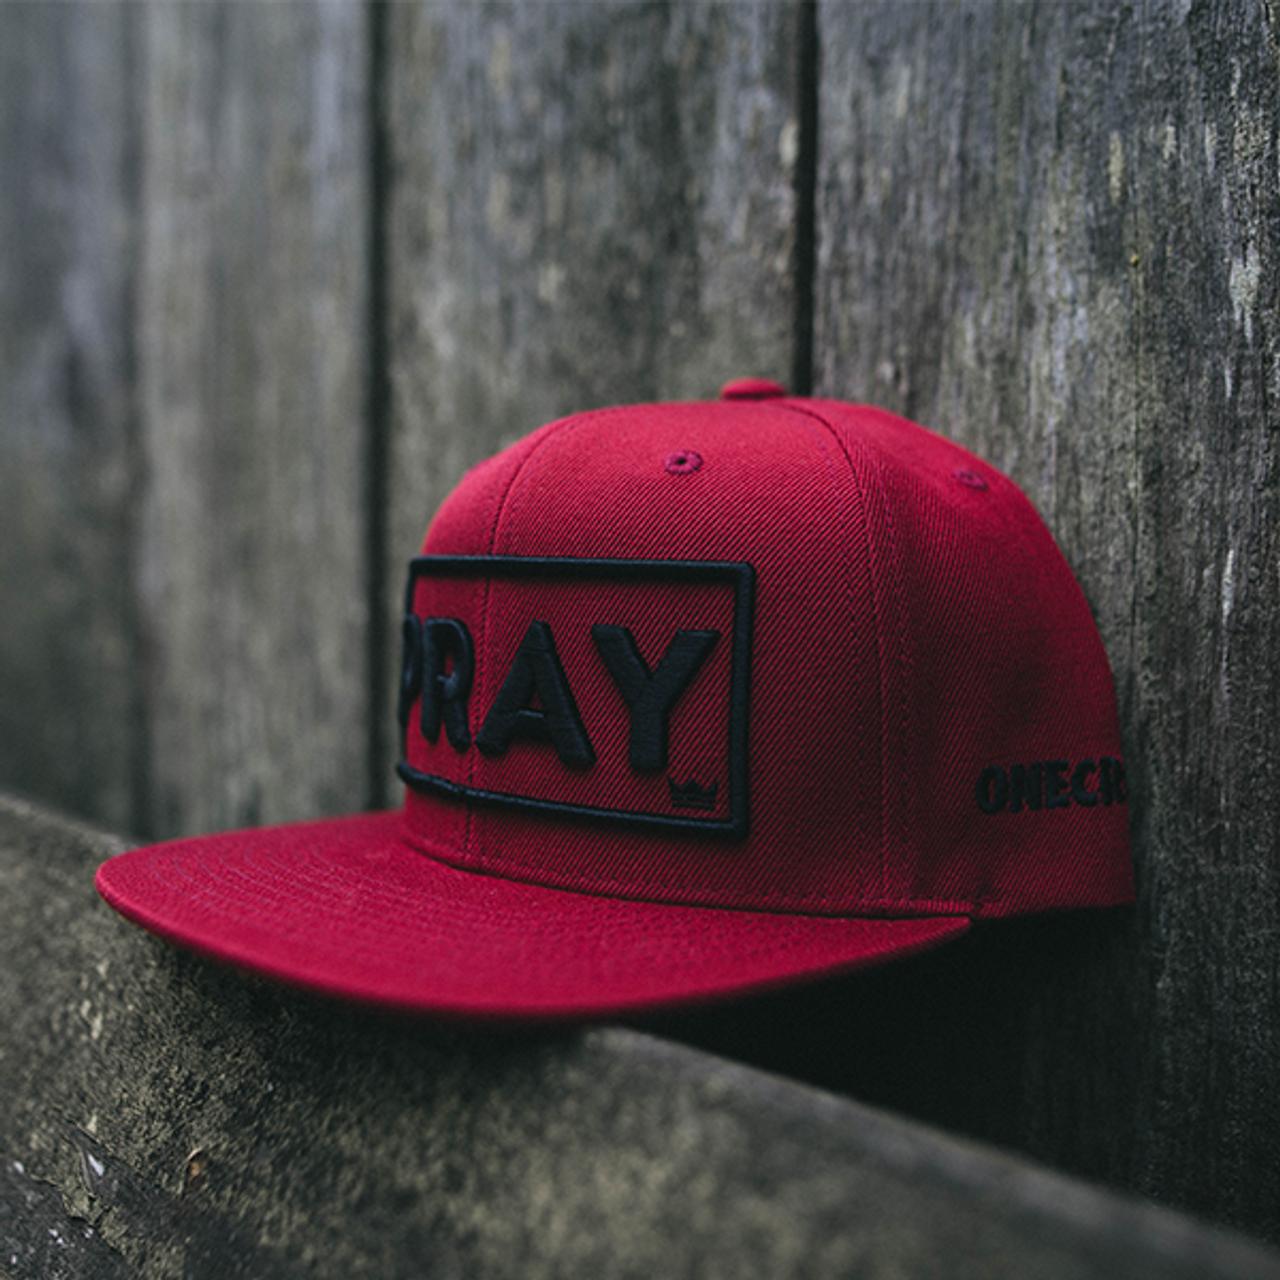 Maroon PRAY Snapback Hat, Christian Streetwear